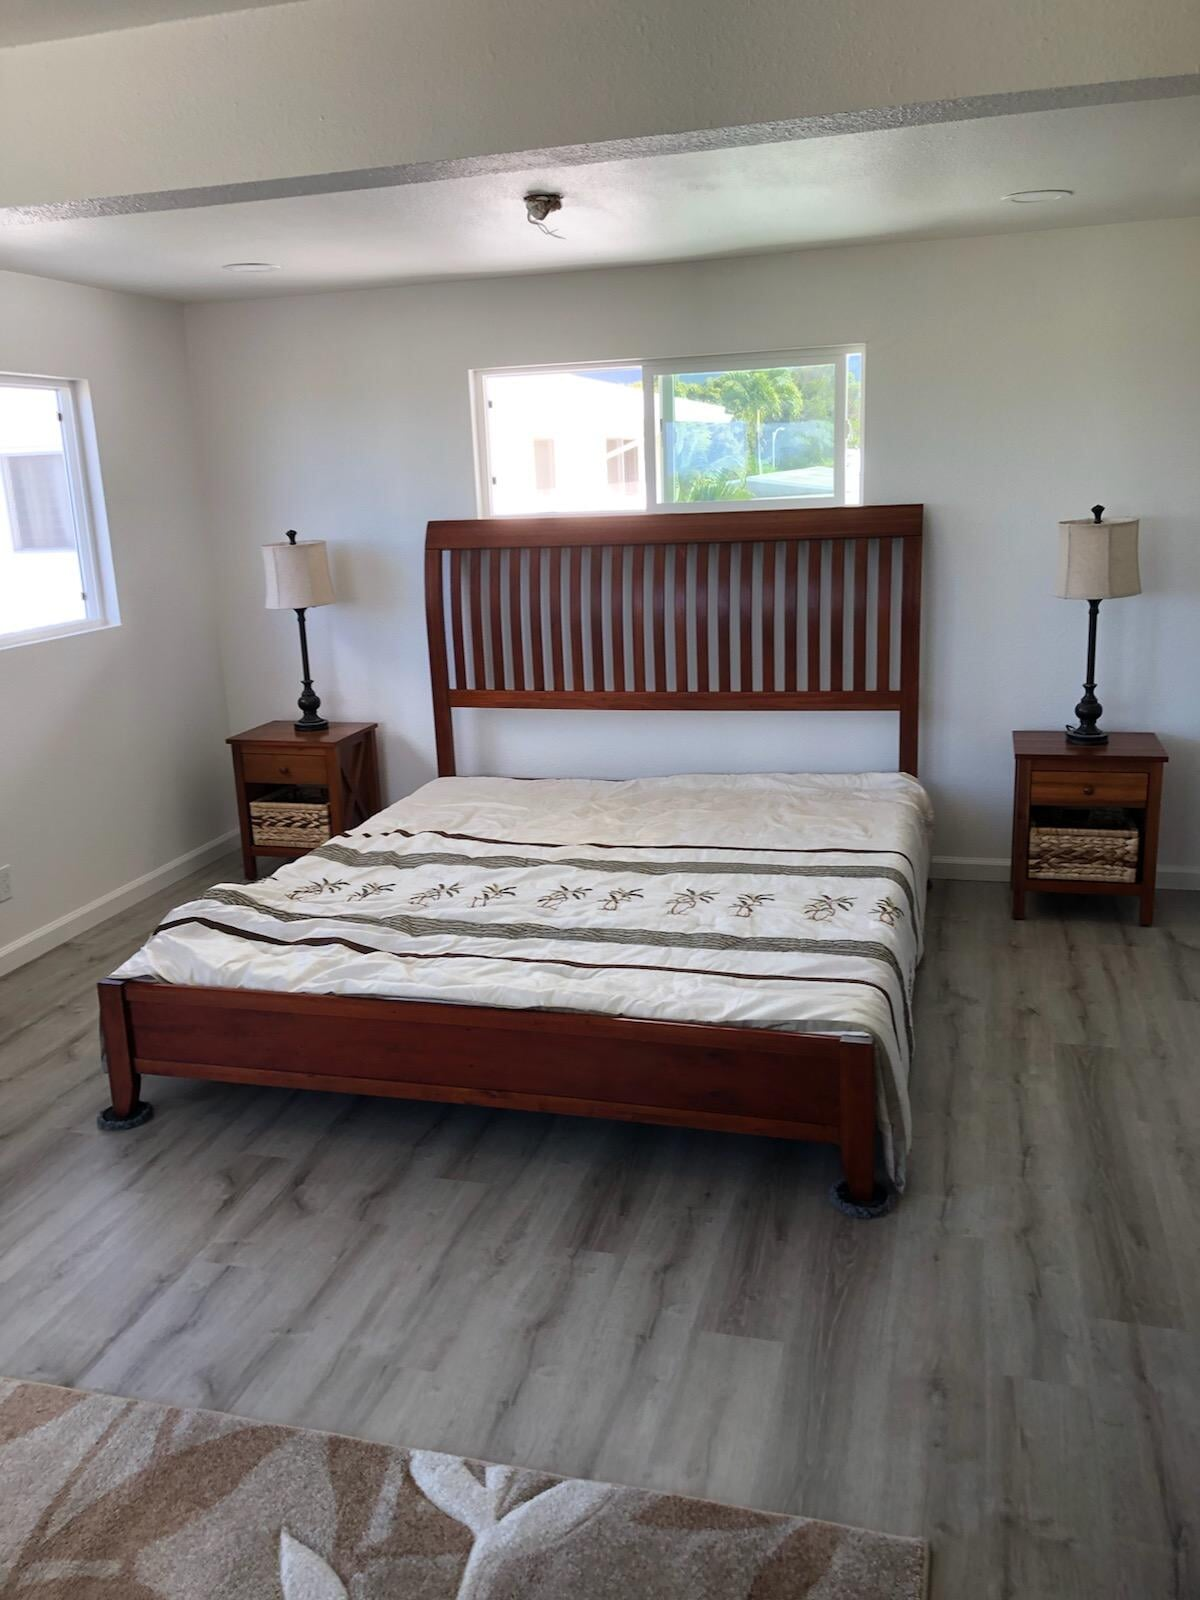 Pacifica: Anvil Beach Oak vinyl plank flooring in Ewa Beach, HI